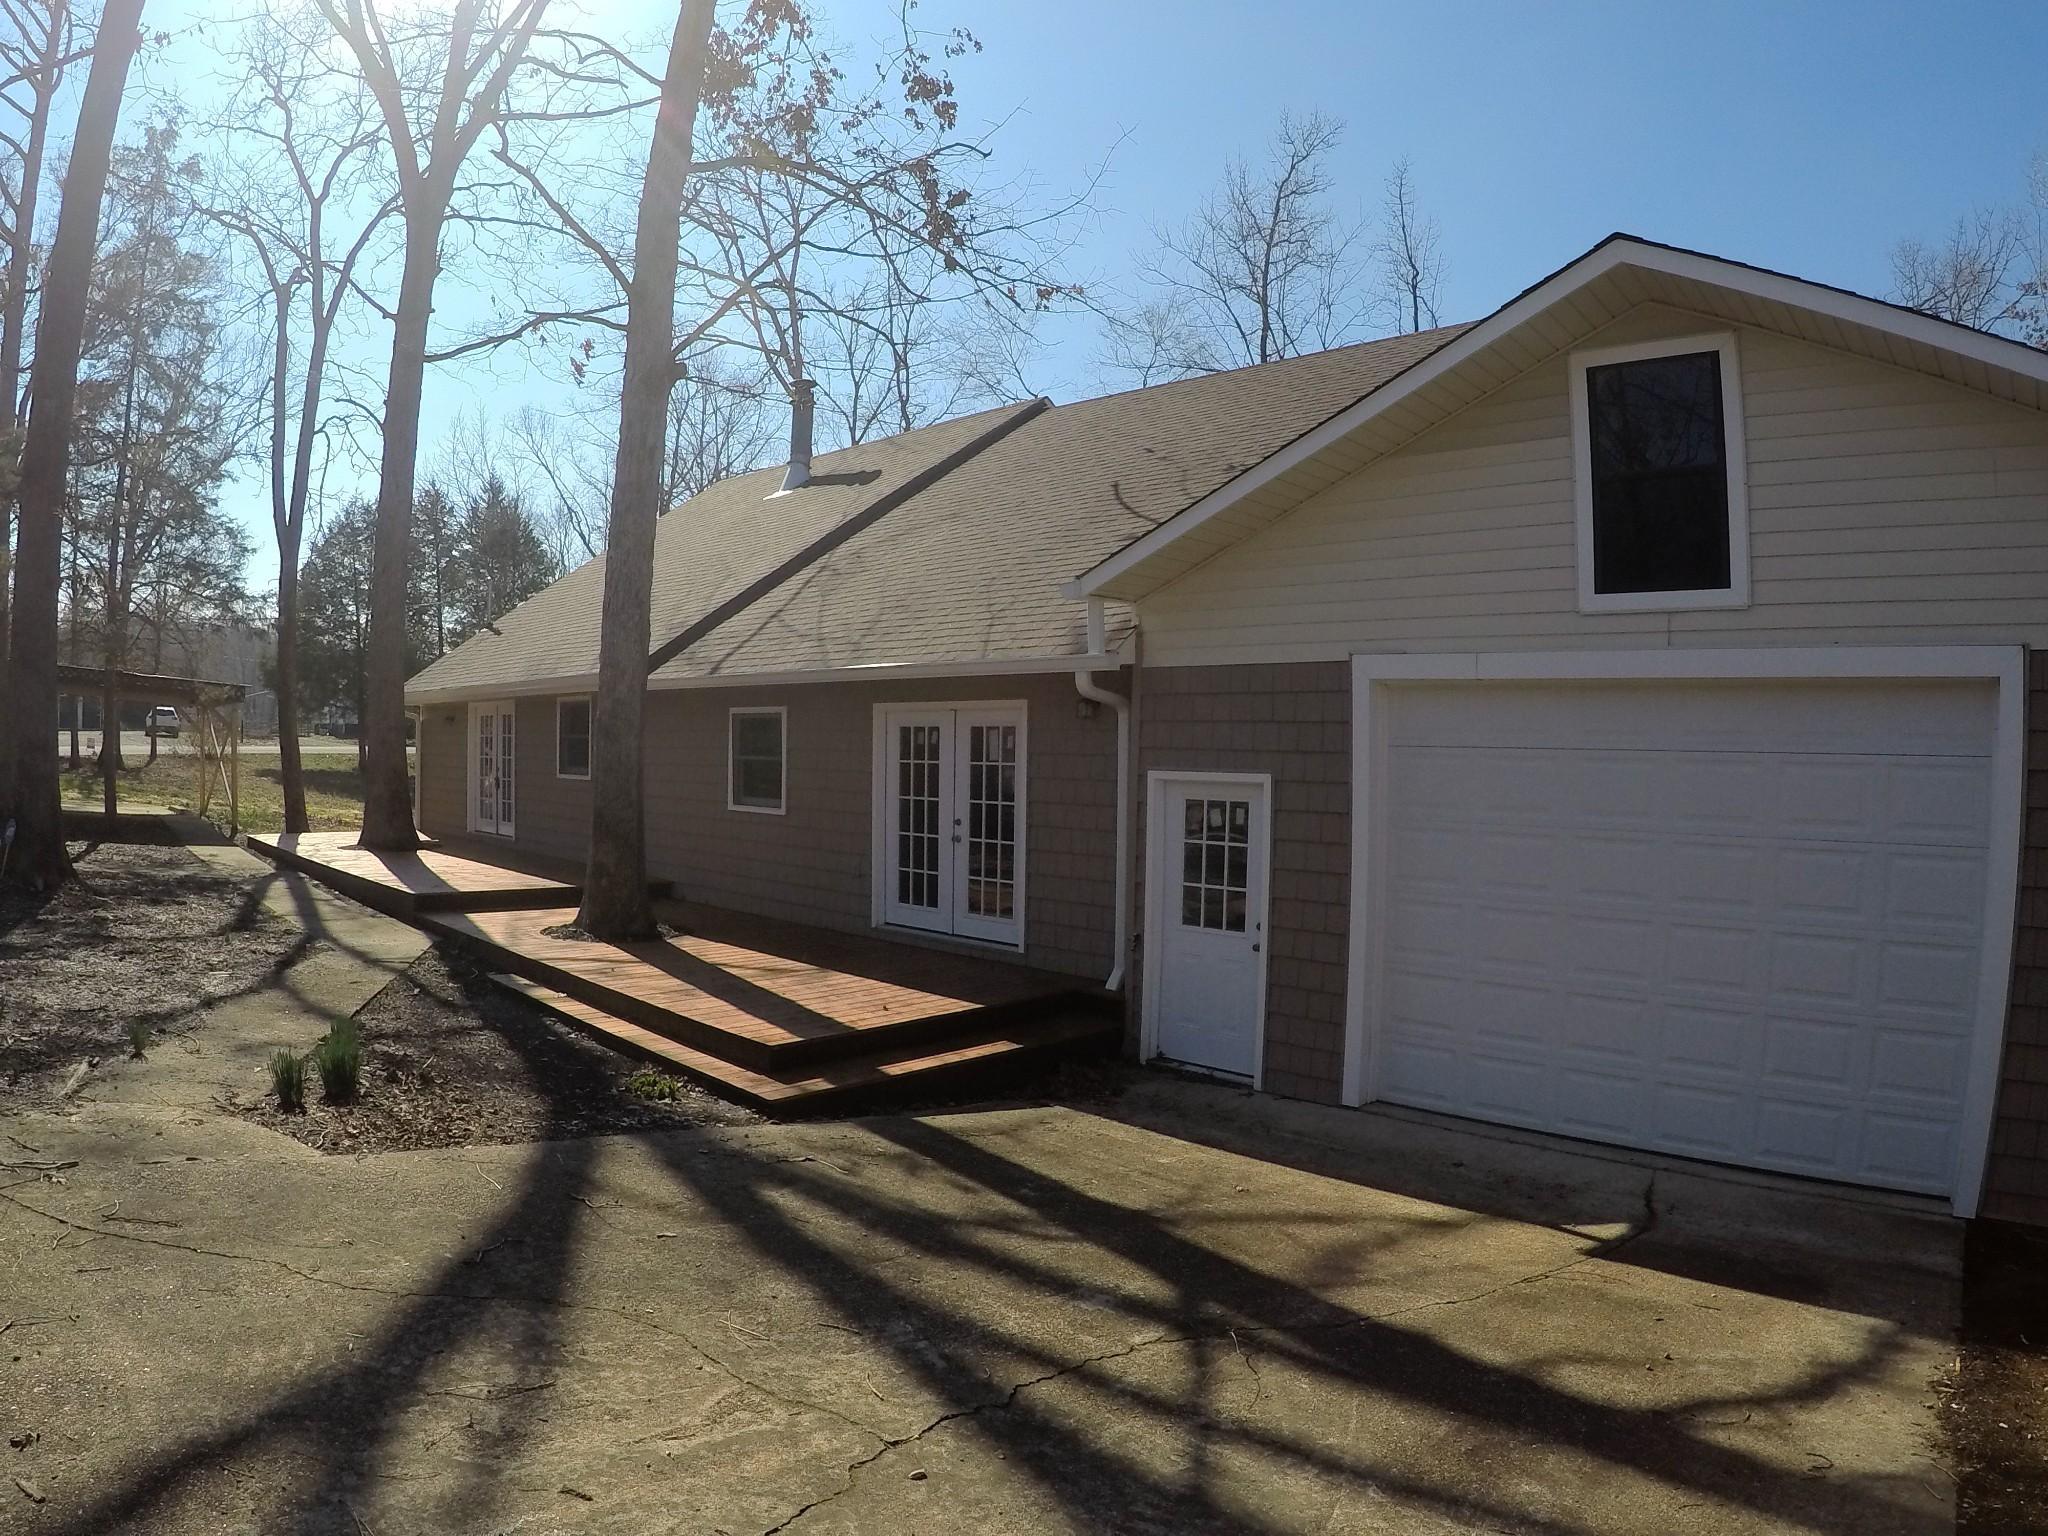 29 Nix Rd, Lobelville, TN 37097 - Lobelville, TN real estate listing